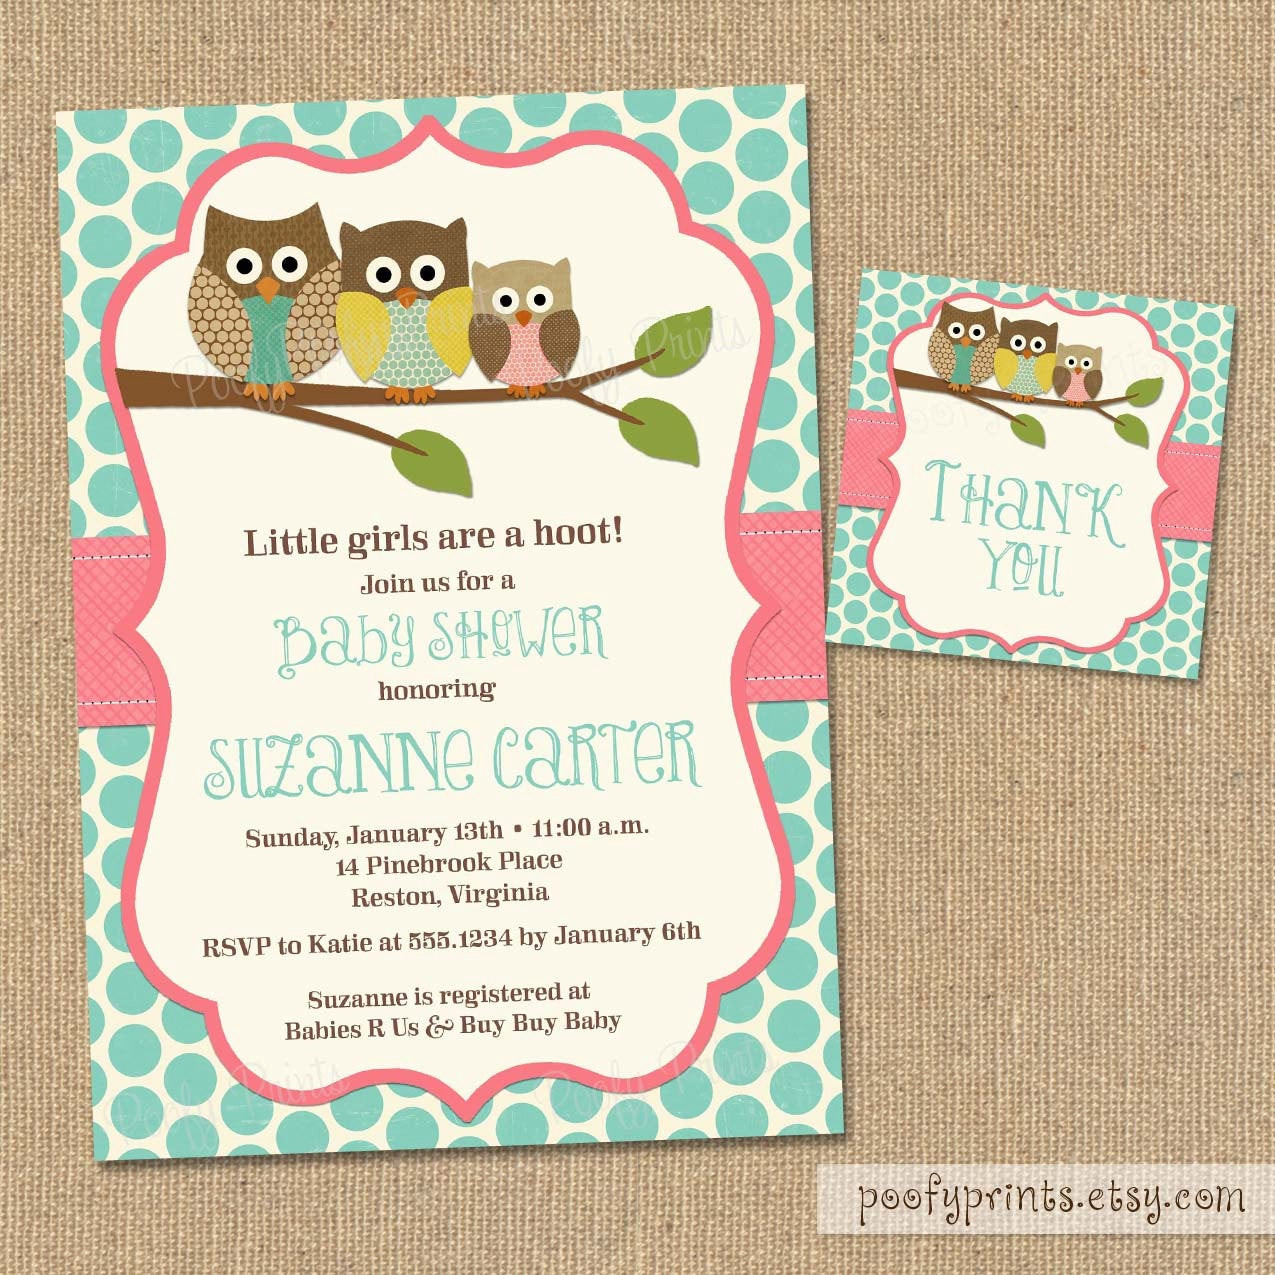 Baby Shower Invitations DIY  Owl Baby Shower Invitations DIY Printable Baby Girl Shower